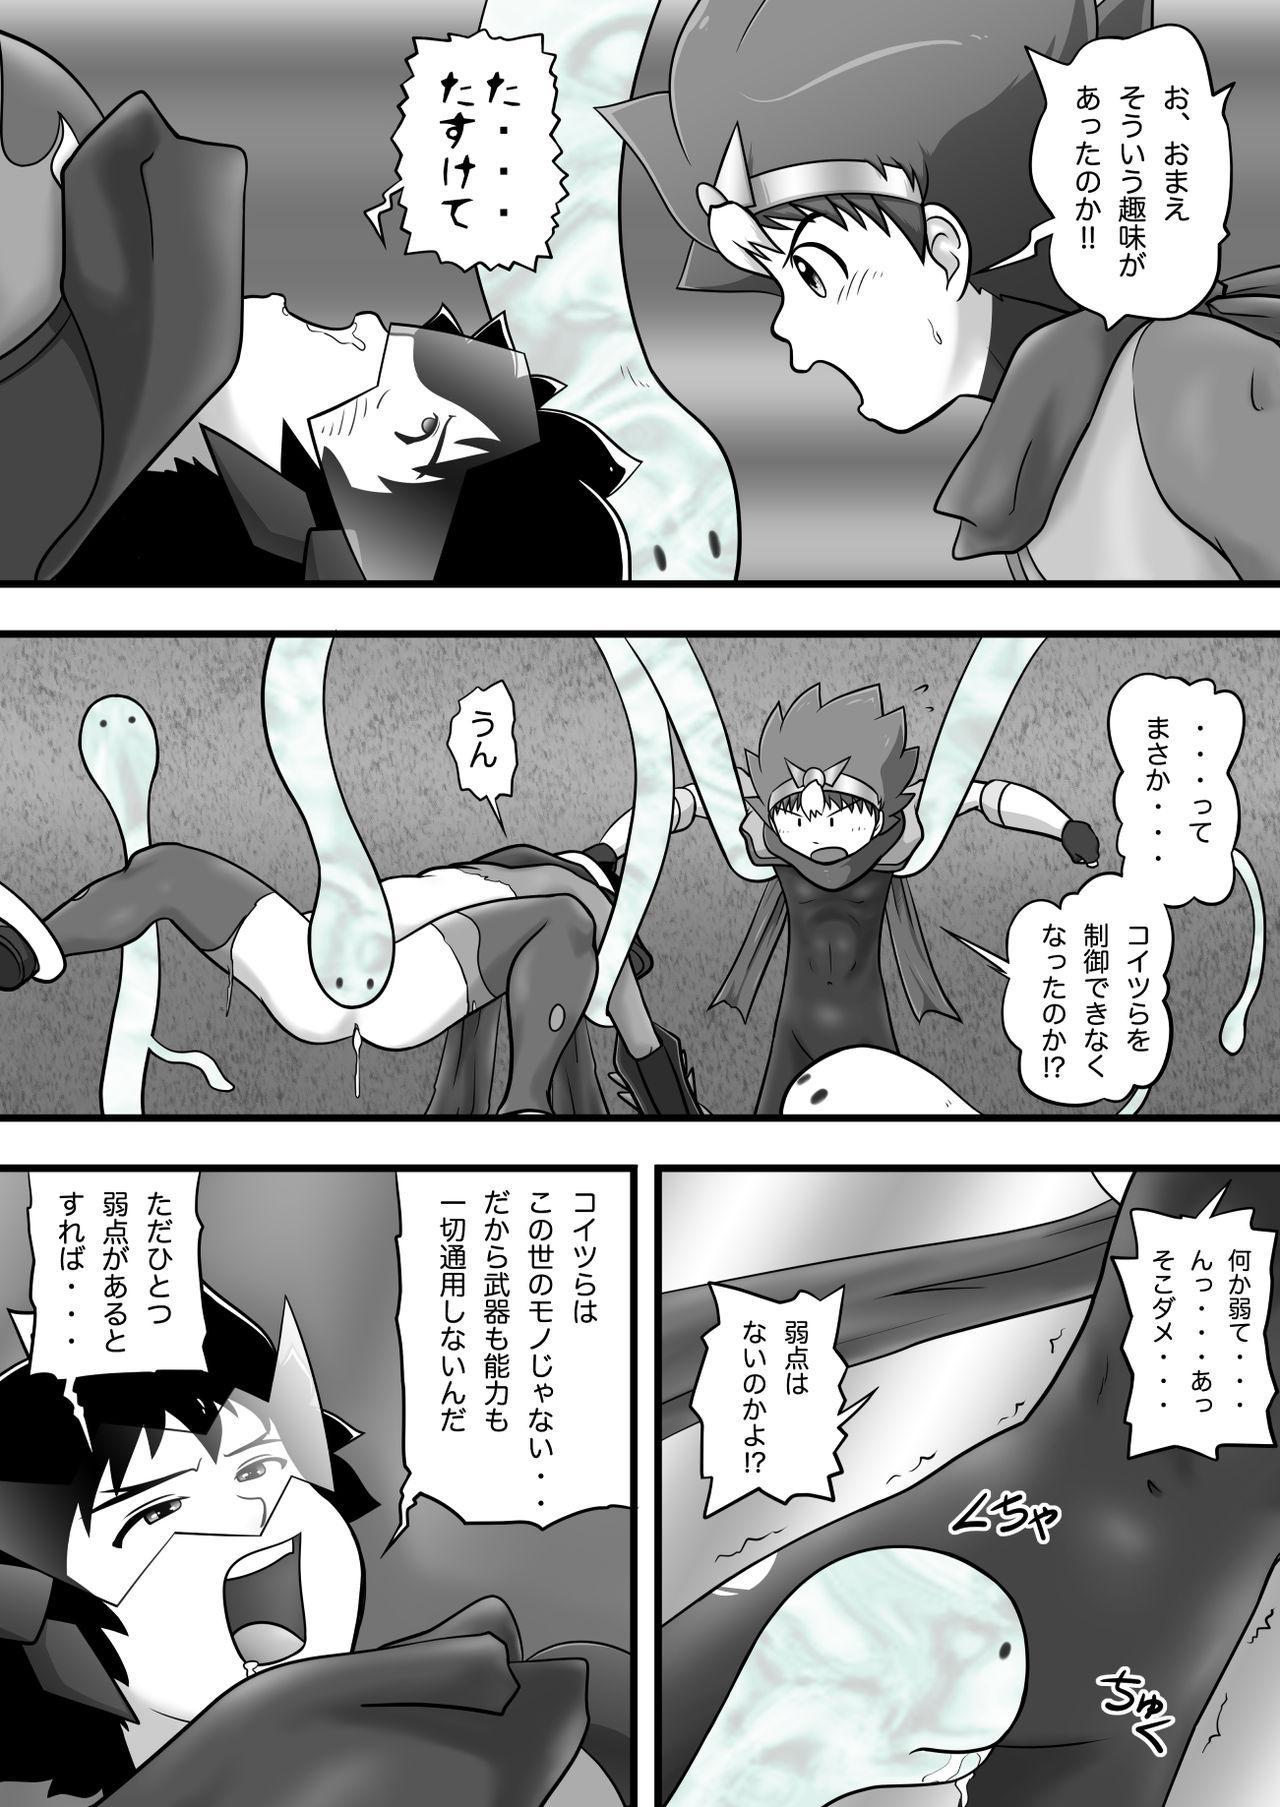 Chrono Kid TSURUGI VS Enboy 24